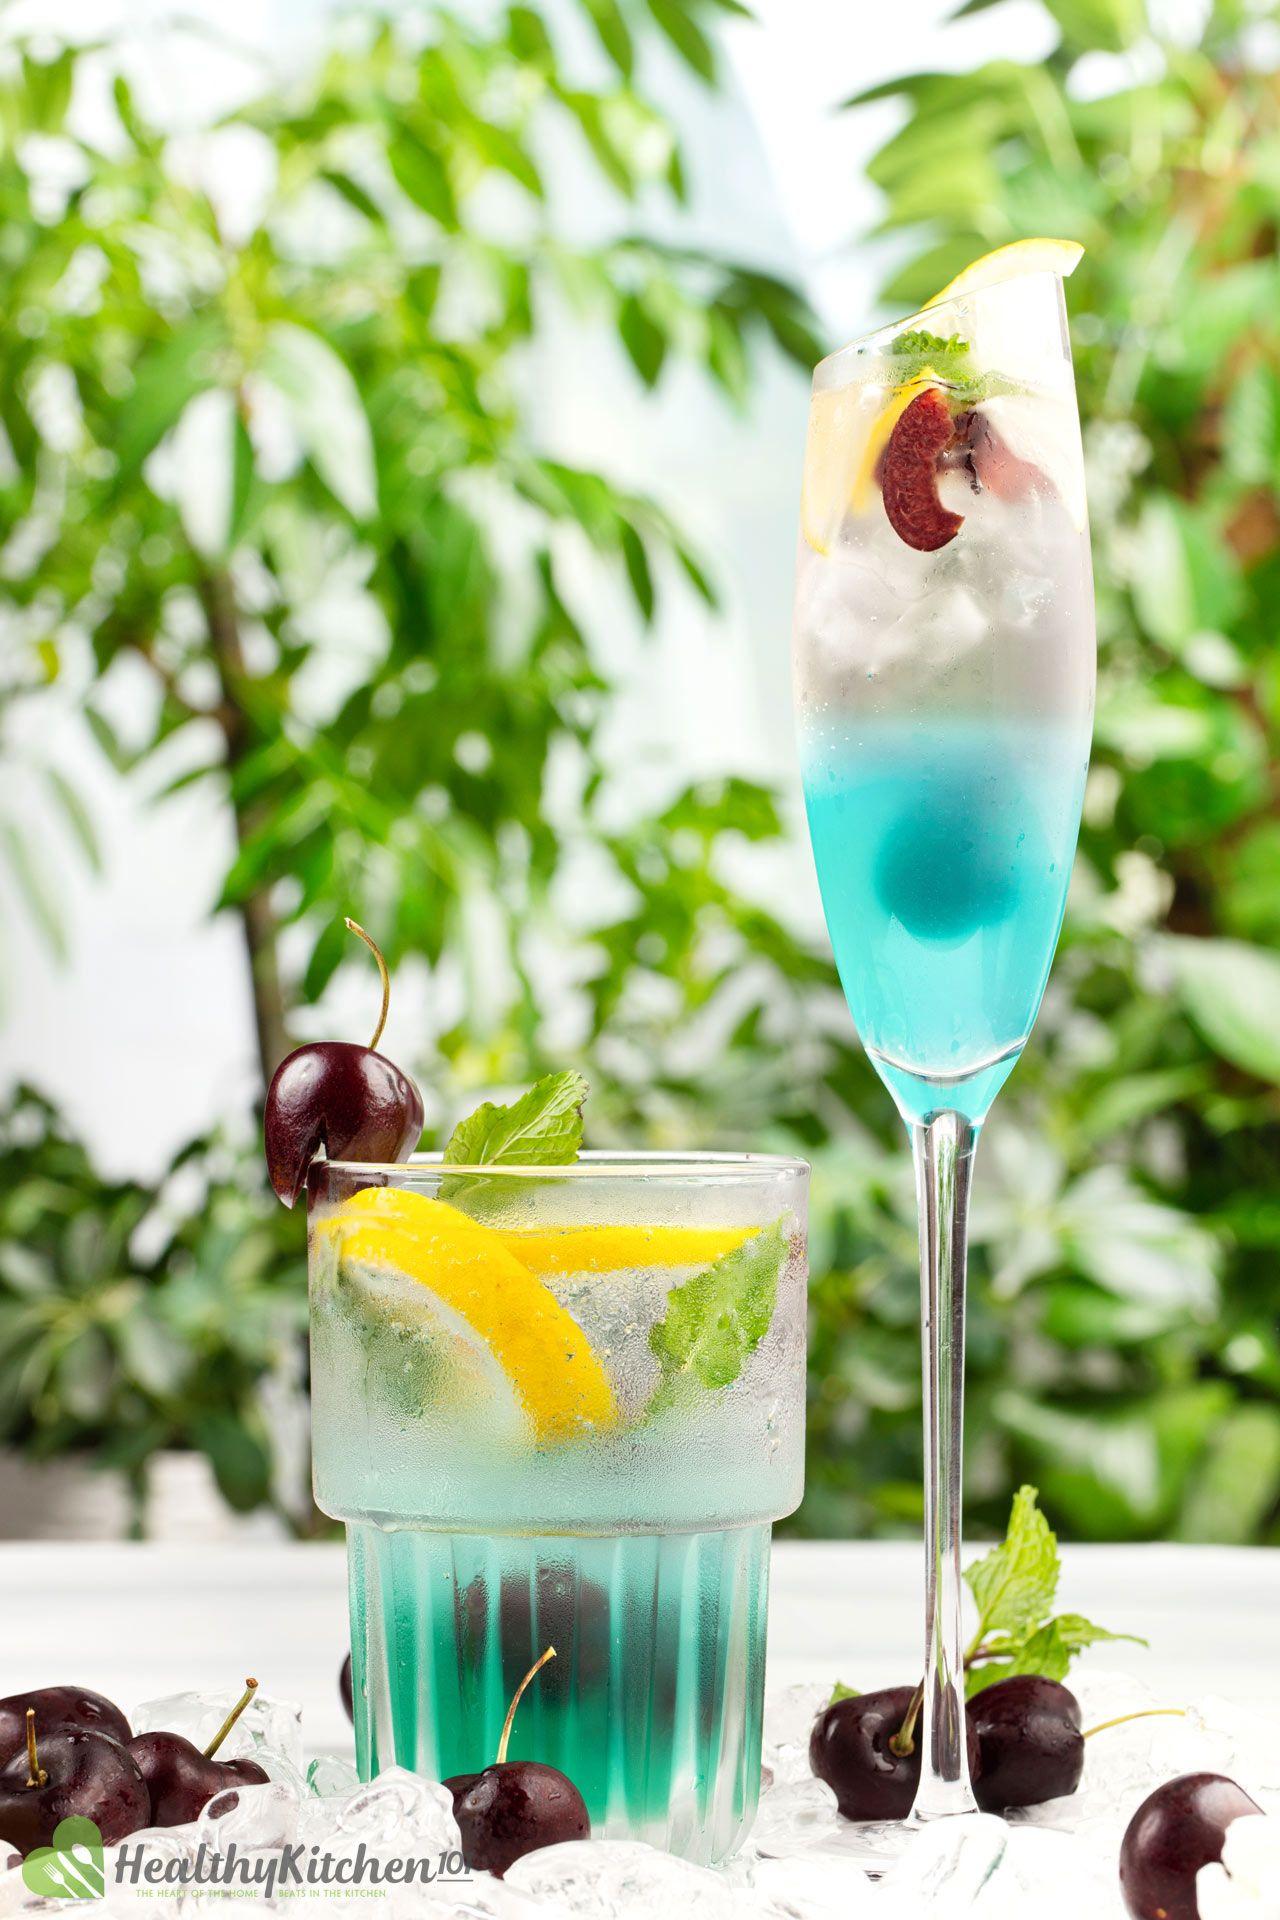 How to Make Jungle Juice